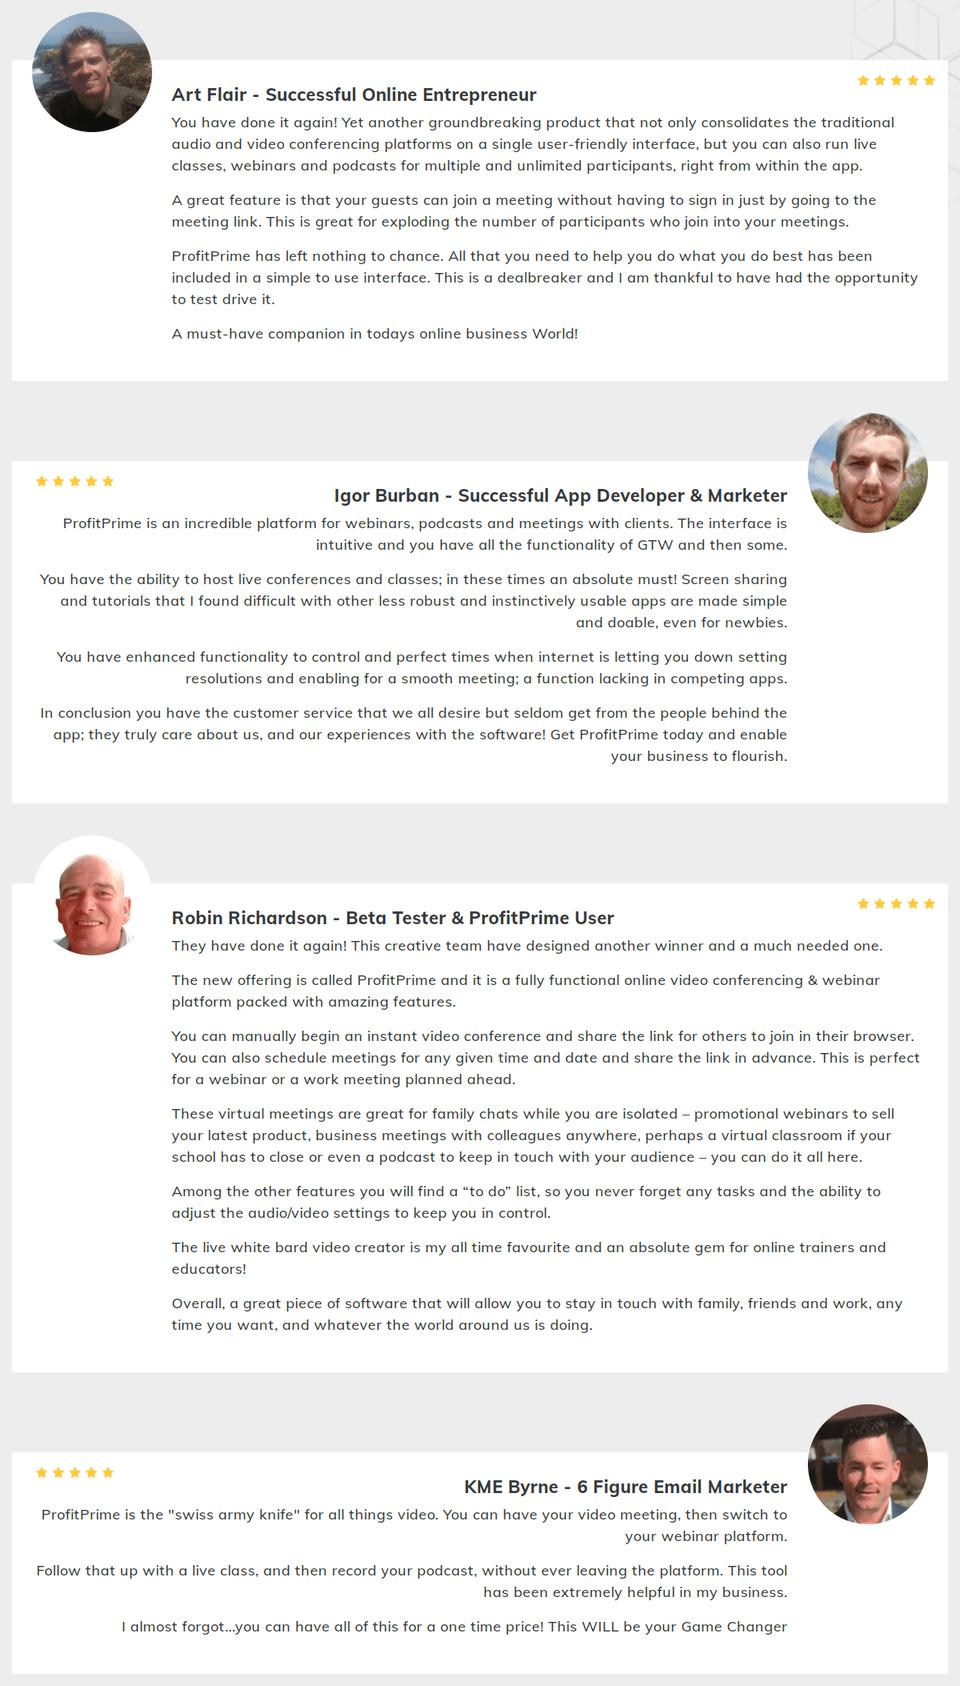 ProfitPrime-feedback-1